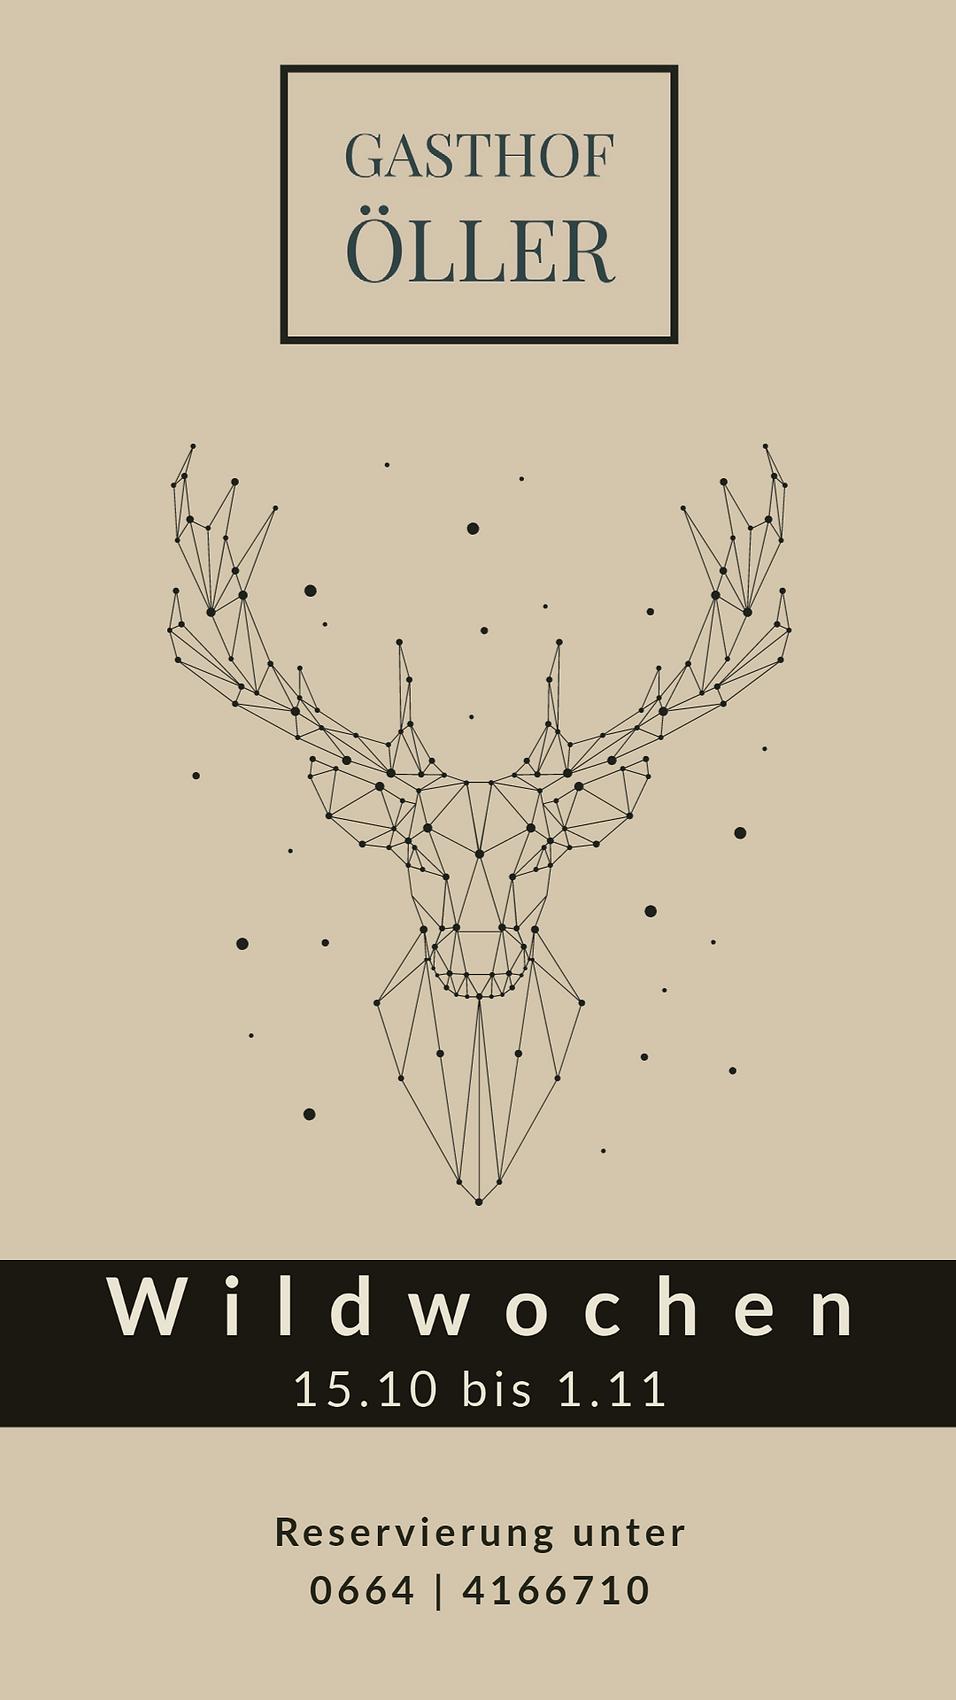 Wildwochen.png